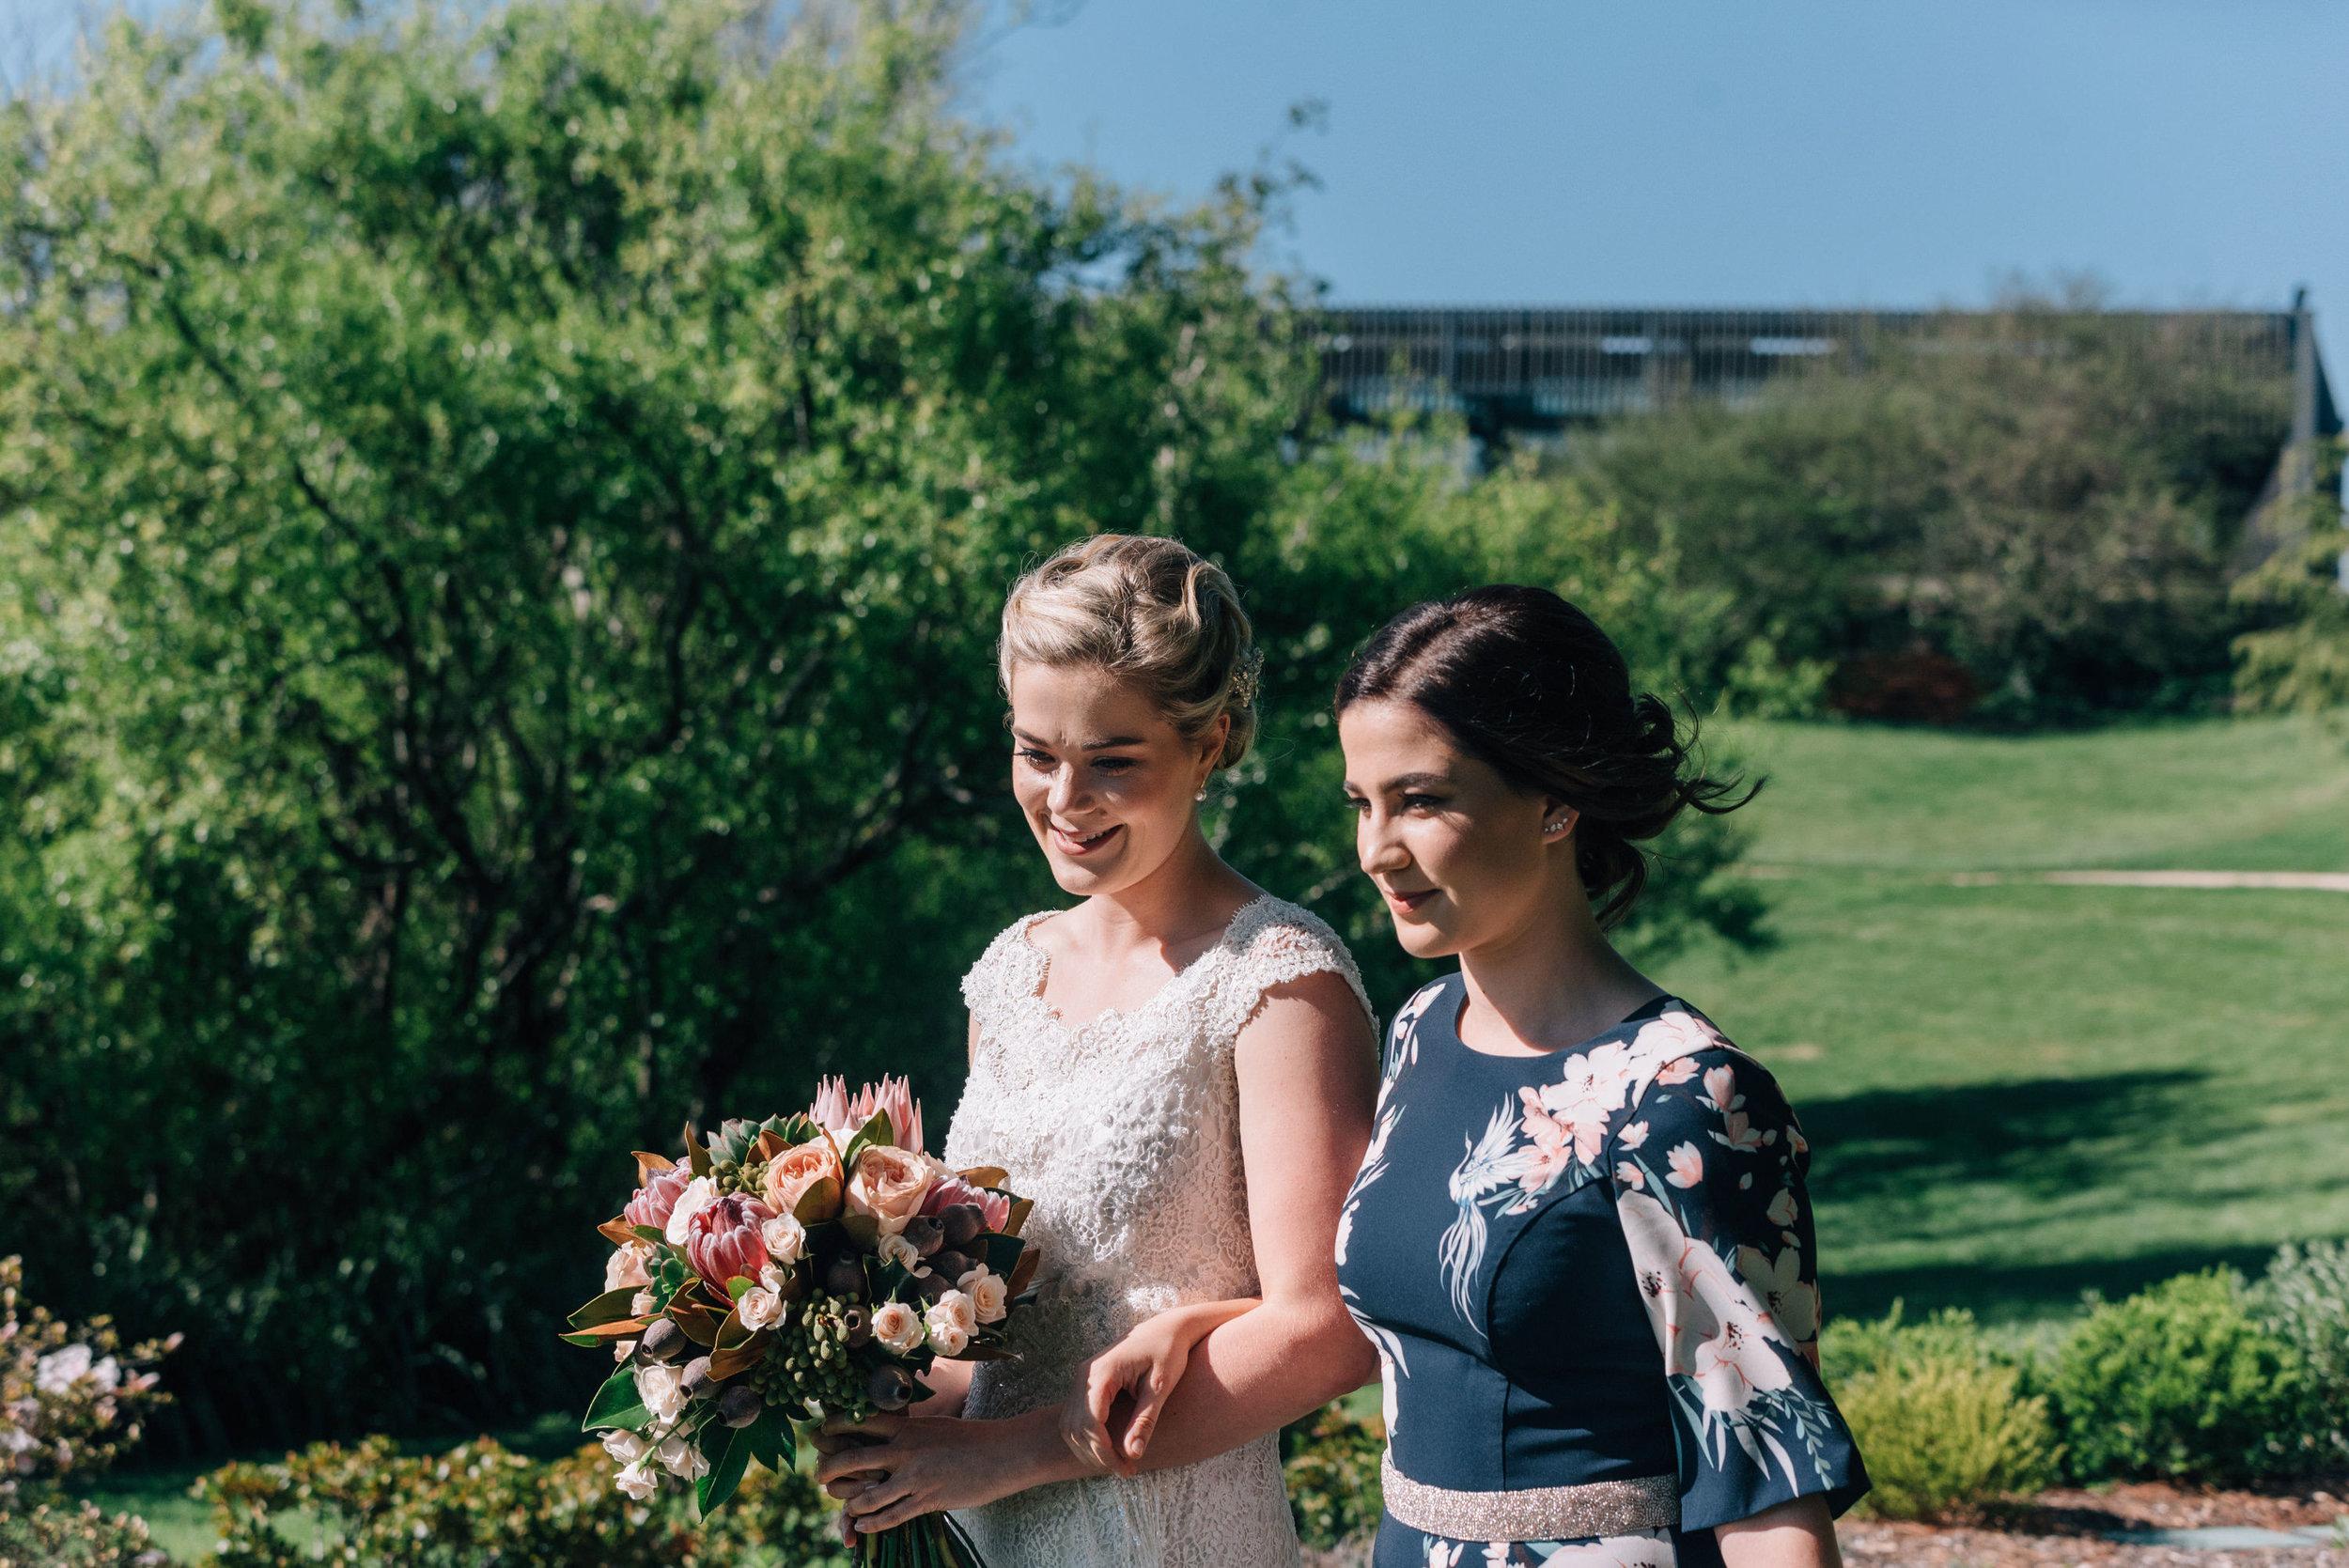 Josef-Chromy-Wedding-30.jpg